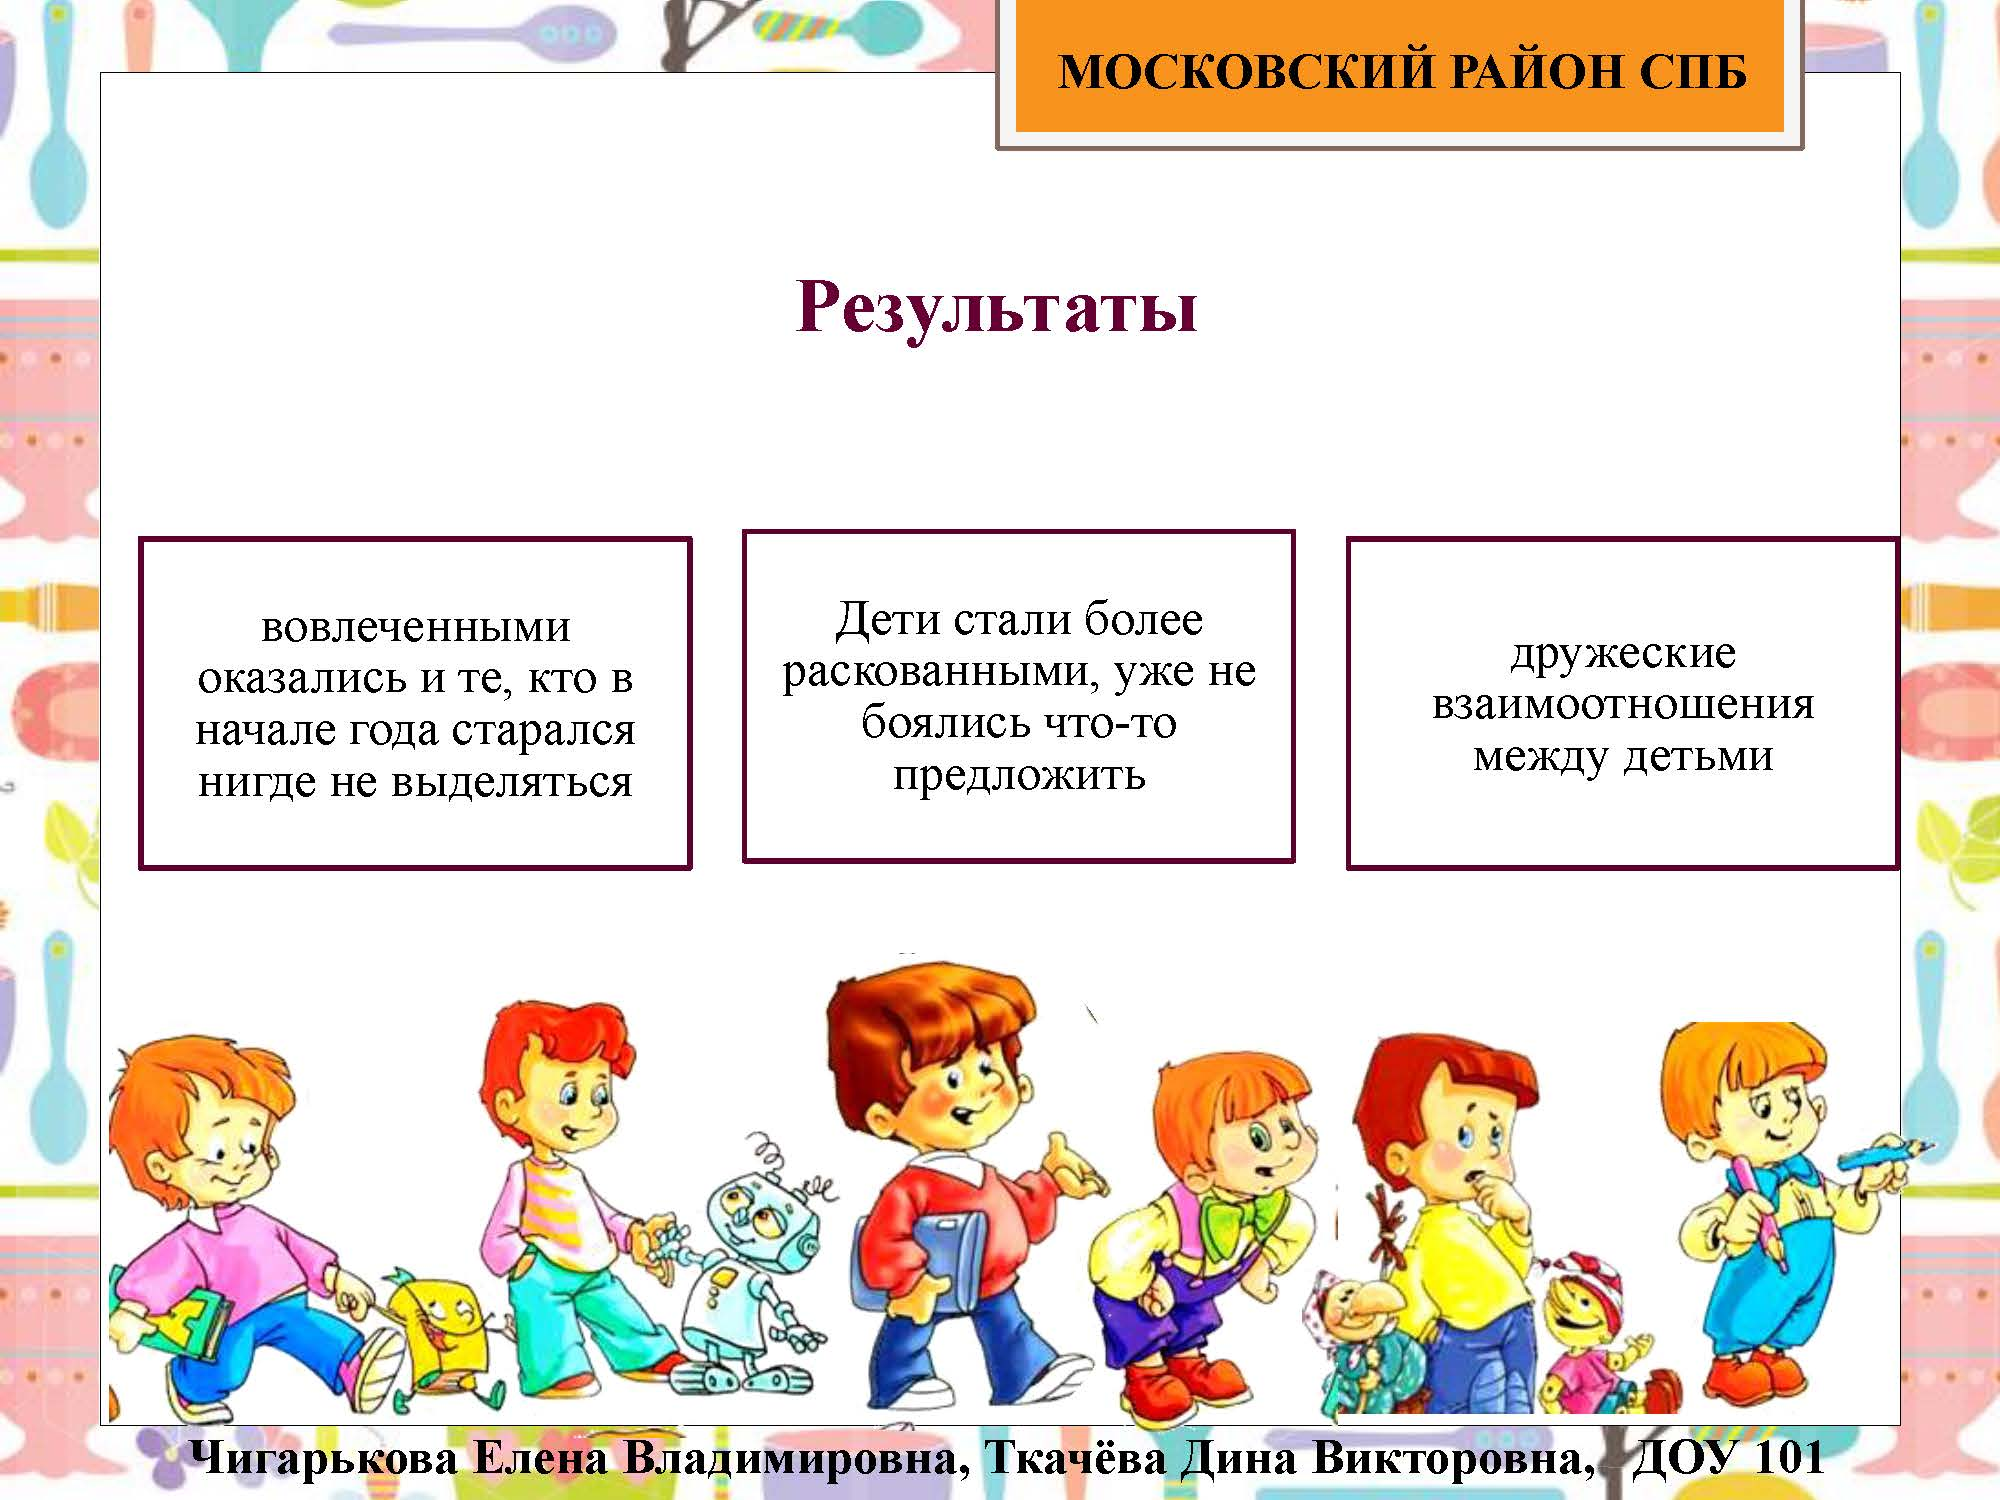 Секция 8. ДОУ 101, ПСИ. Московский район_Страница_27